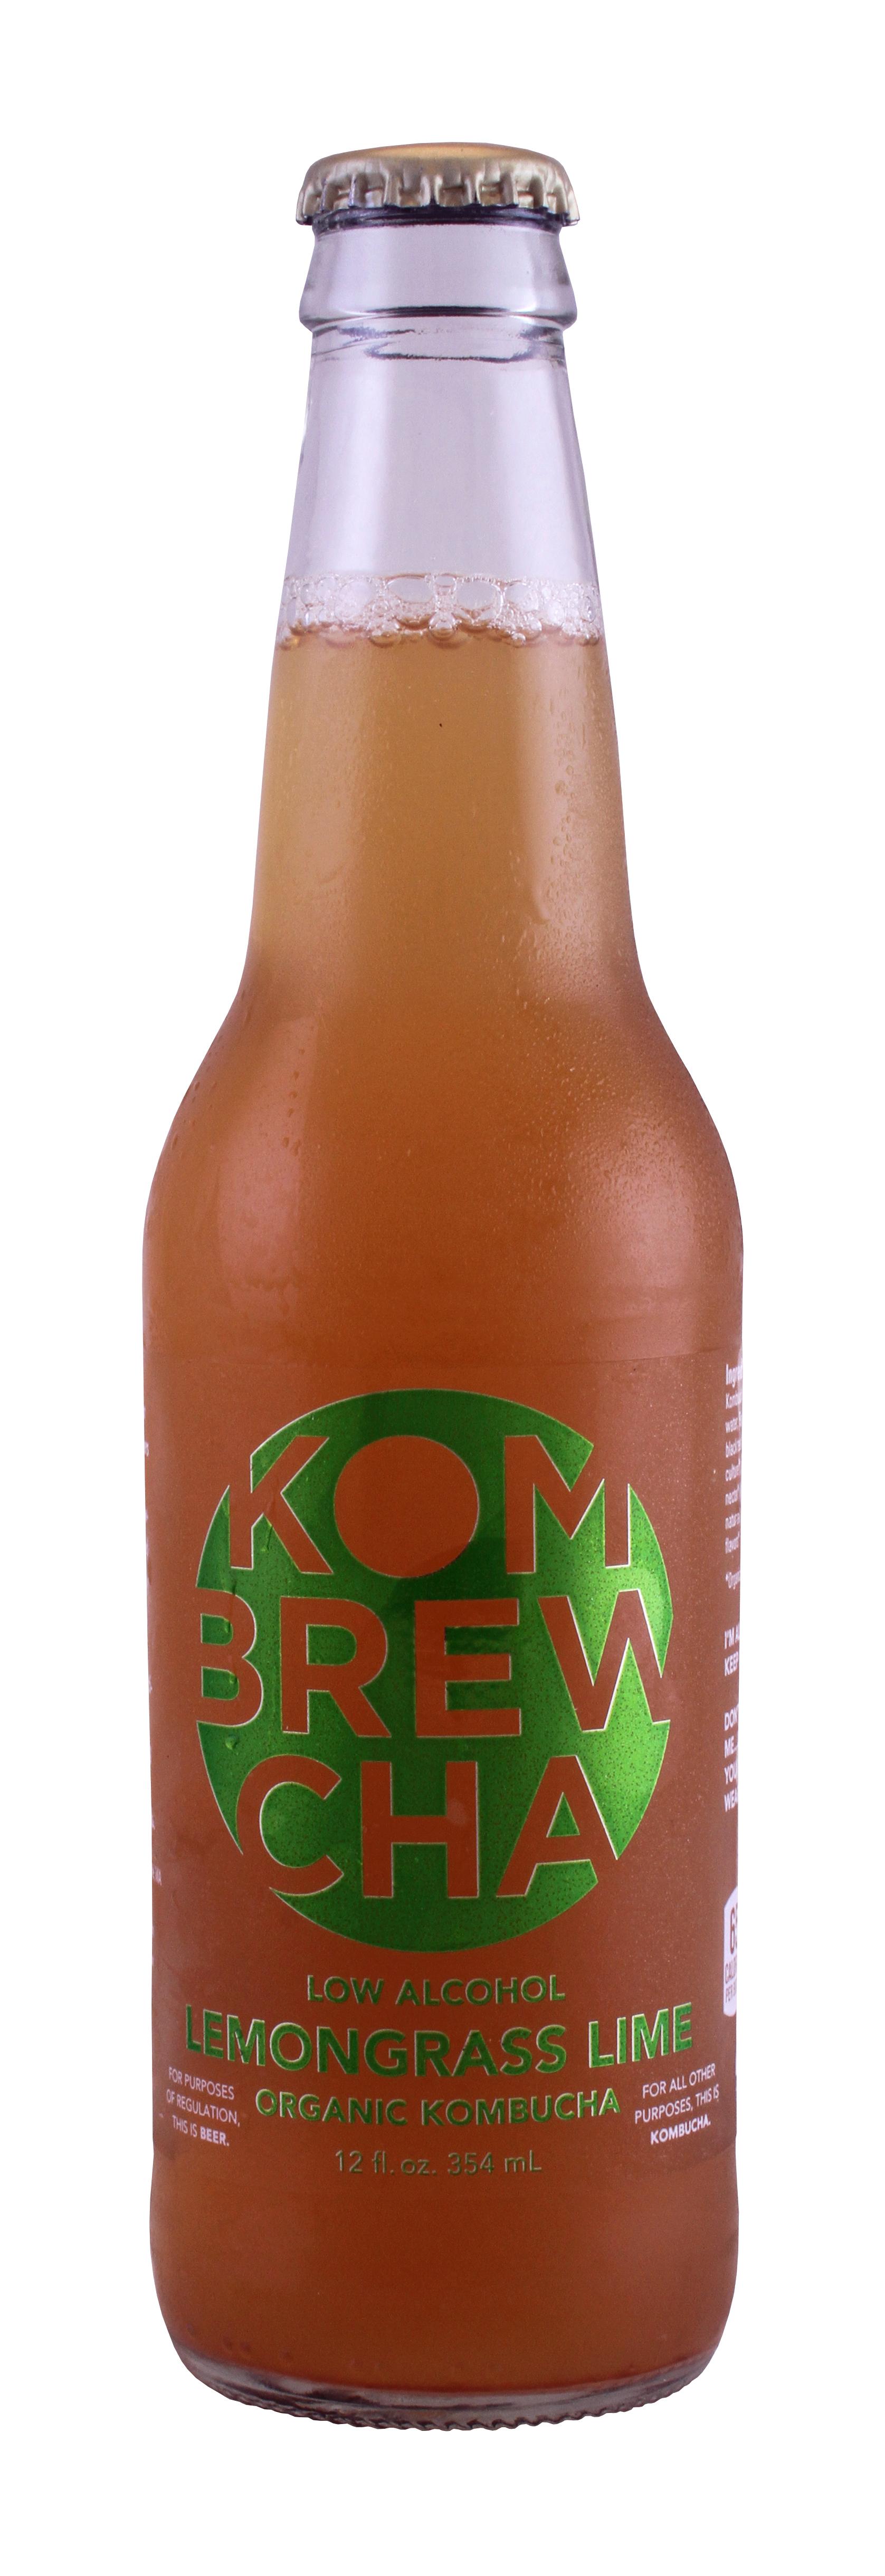 KomBrewCha: KomBrewCha Lemongrass Front